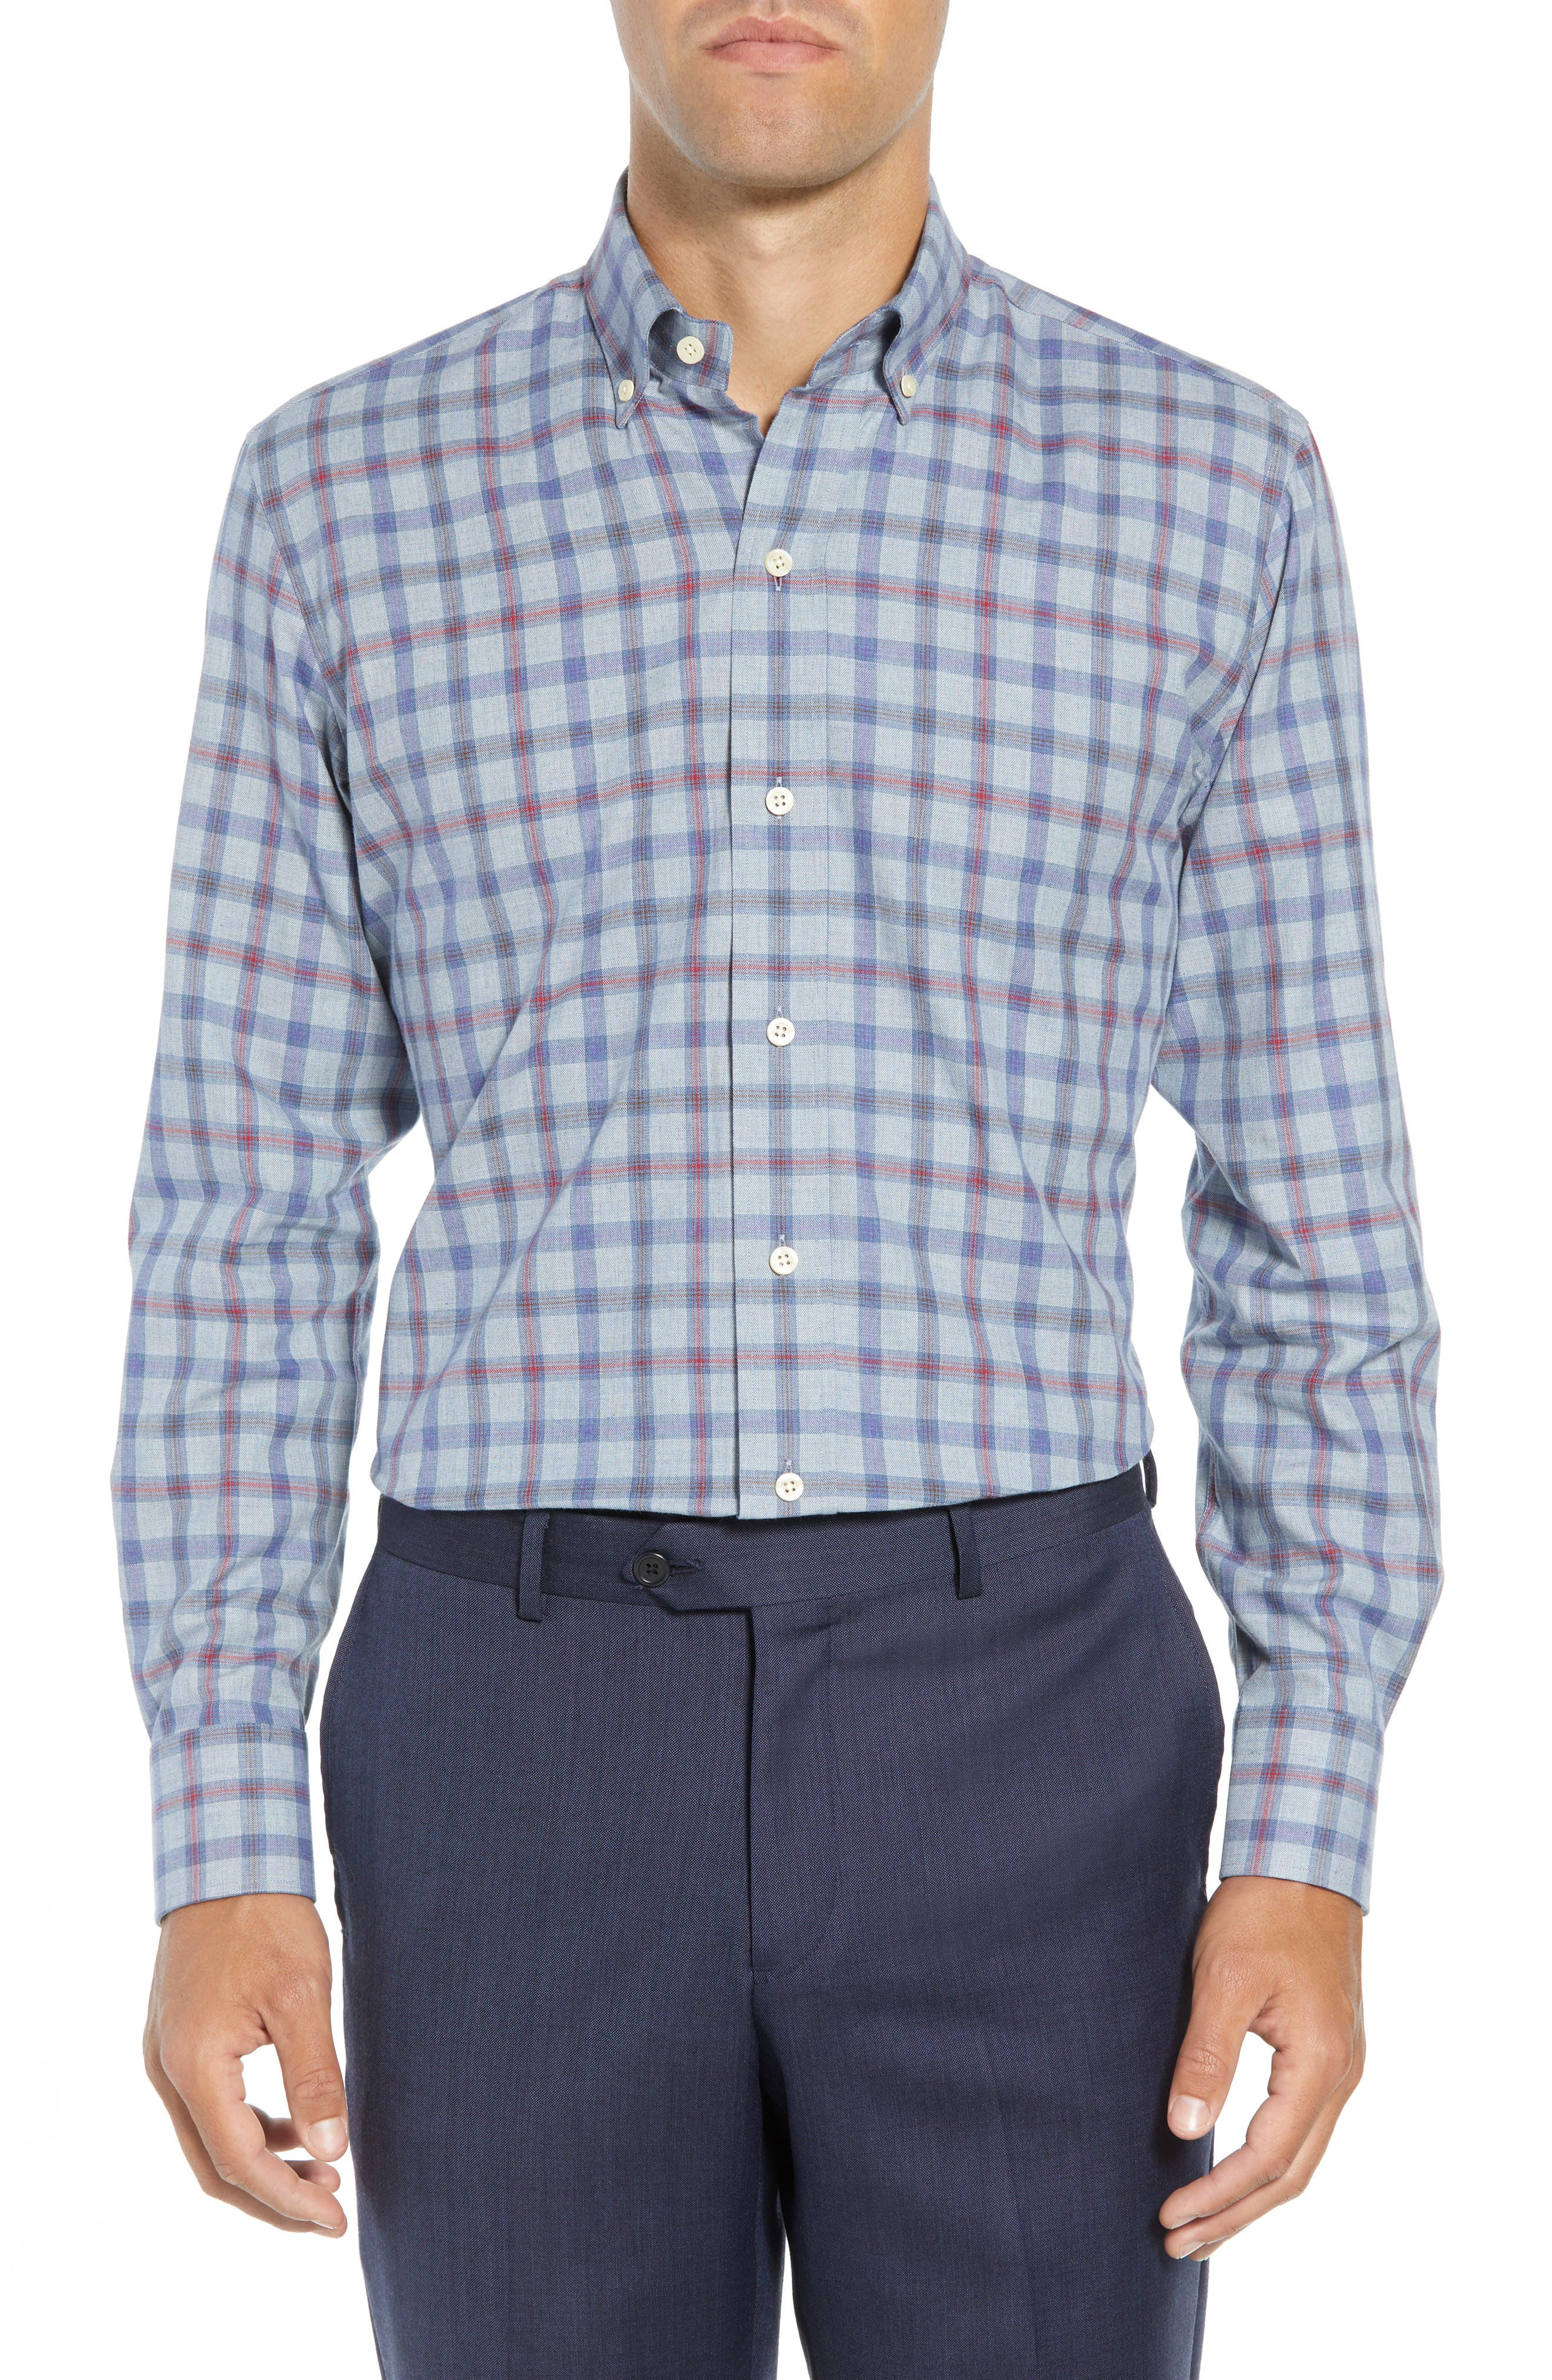 Hilbank Trim Fit Check Dress Shirt,                         Main,                         color, CADET BLUE